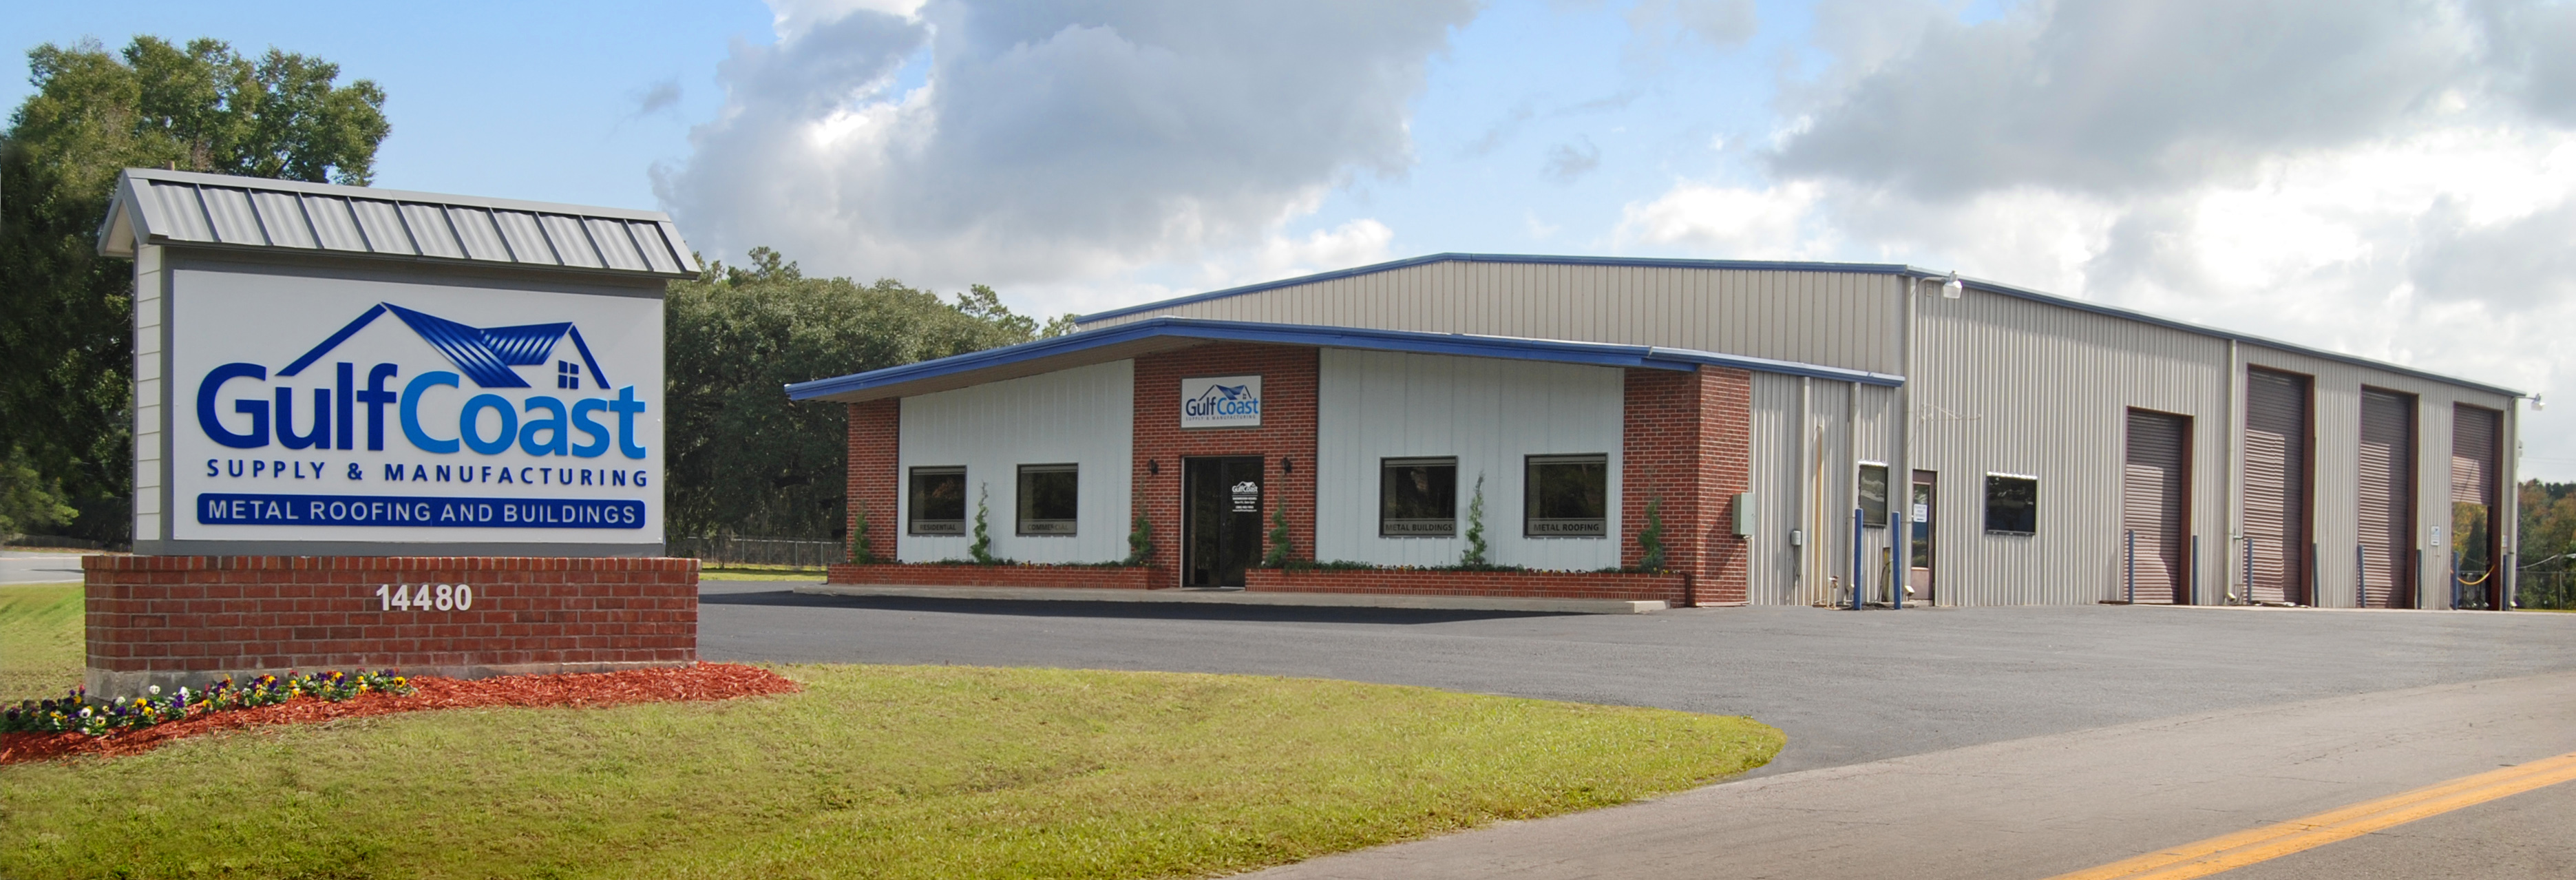 New Stuart Location Helps Gulf Coast Supply Serve The